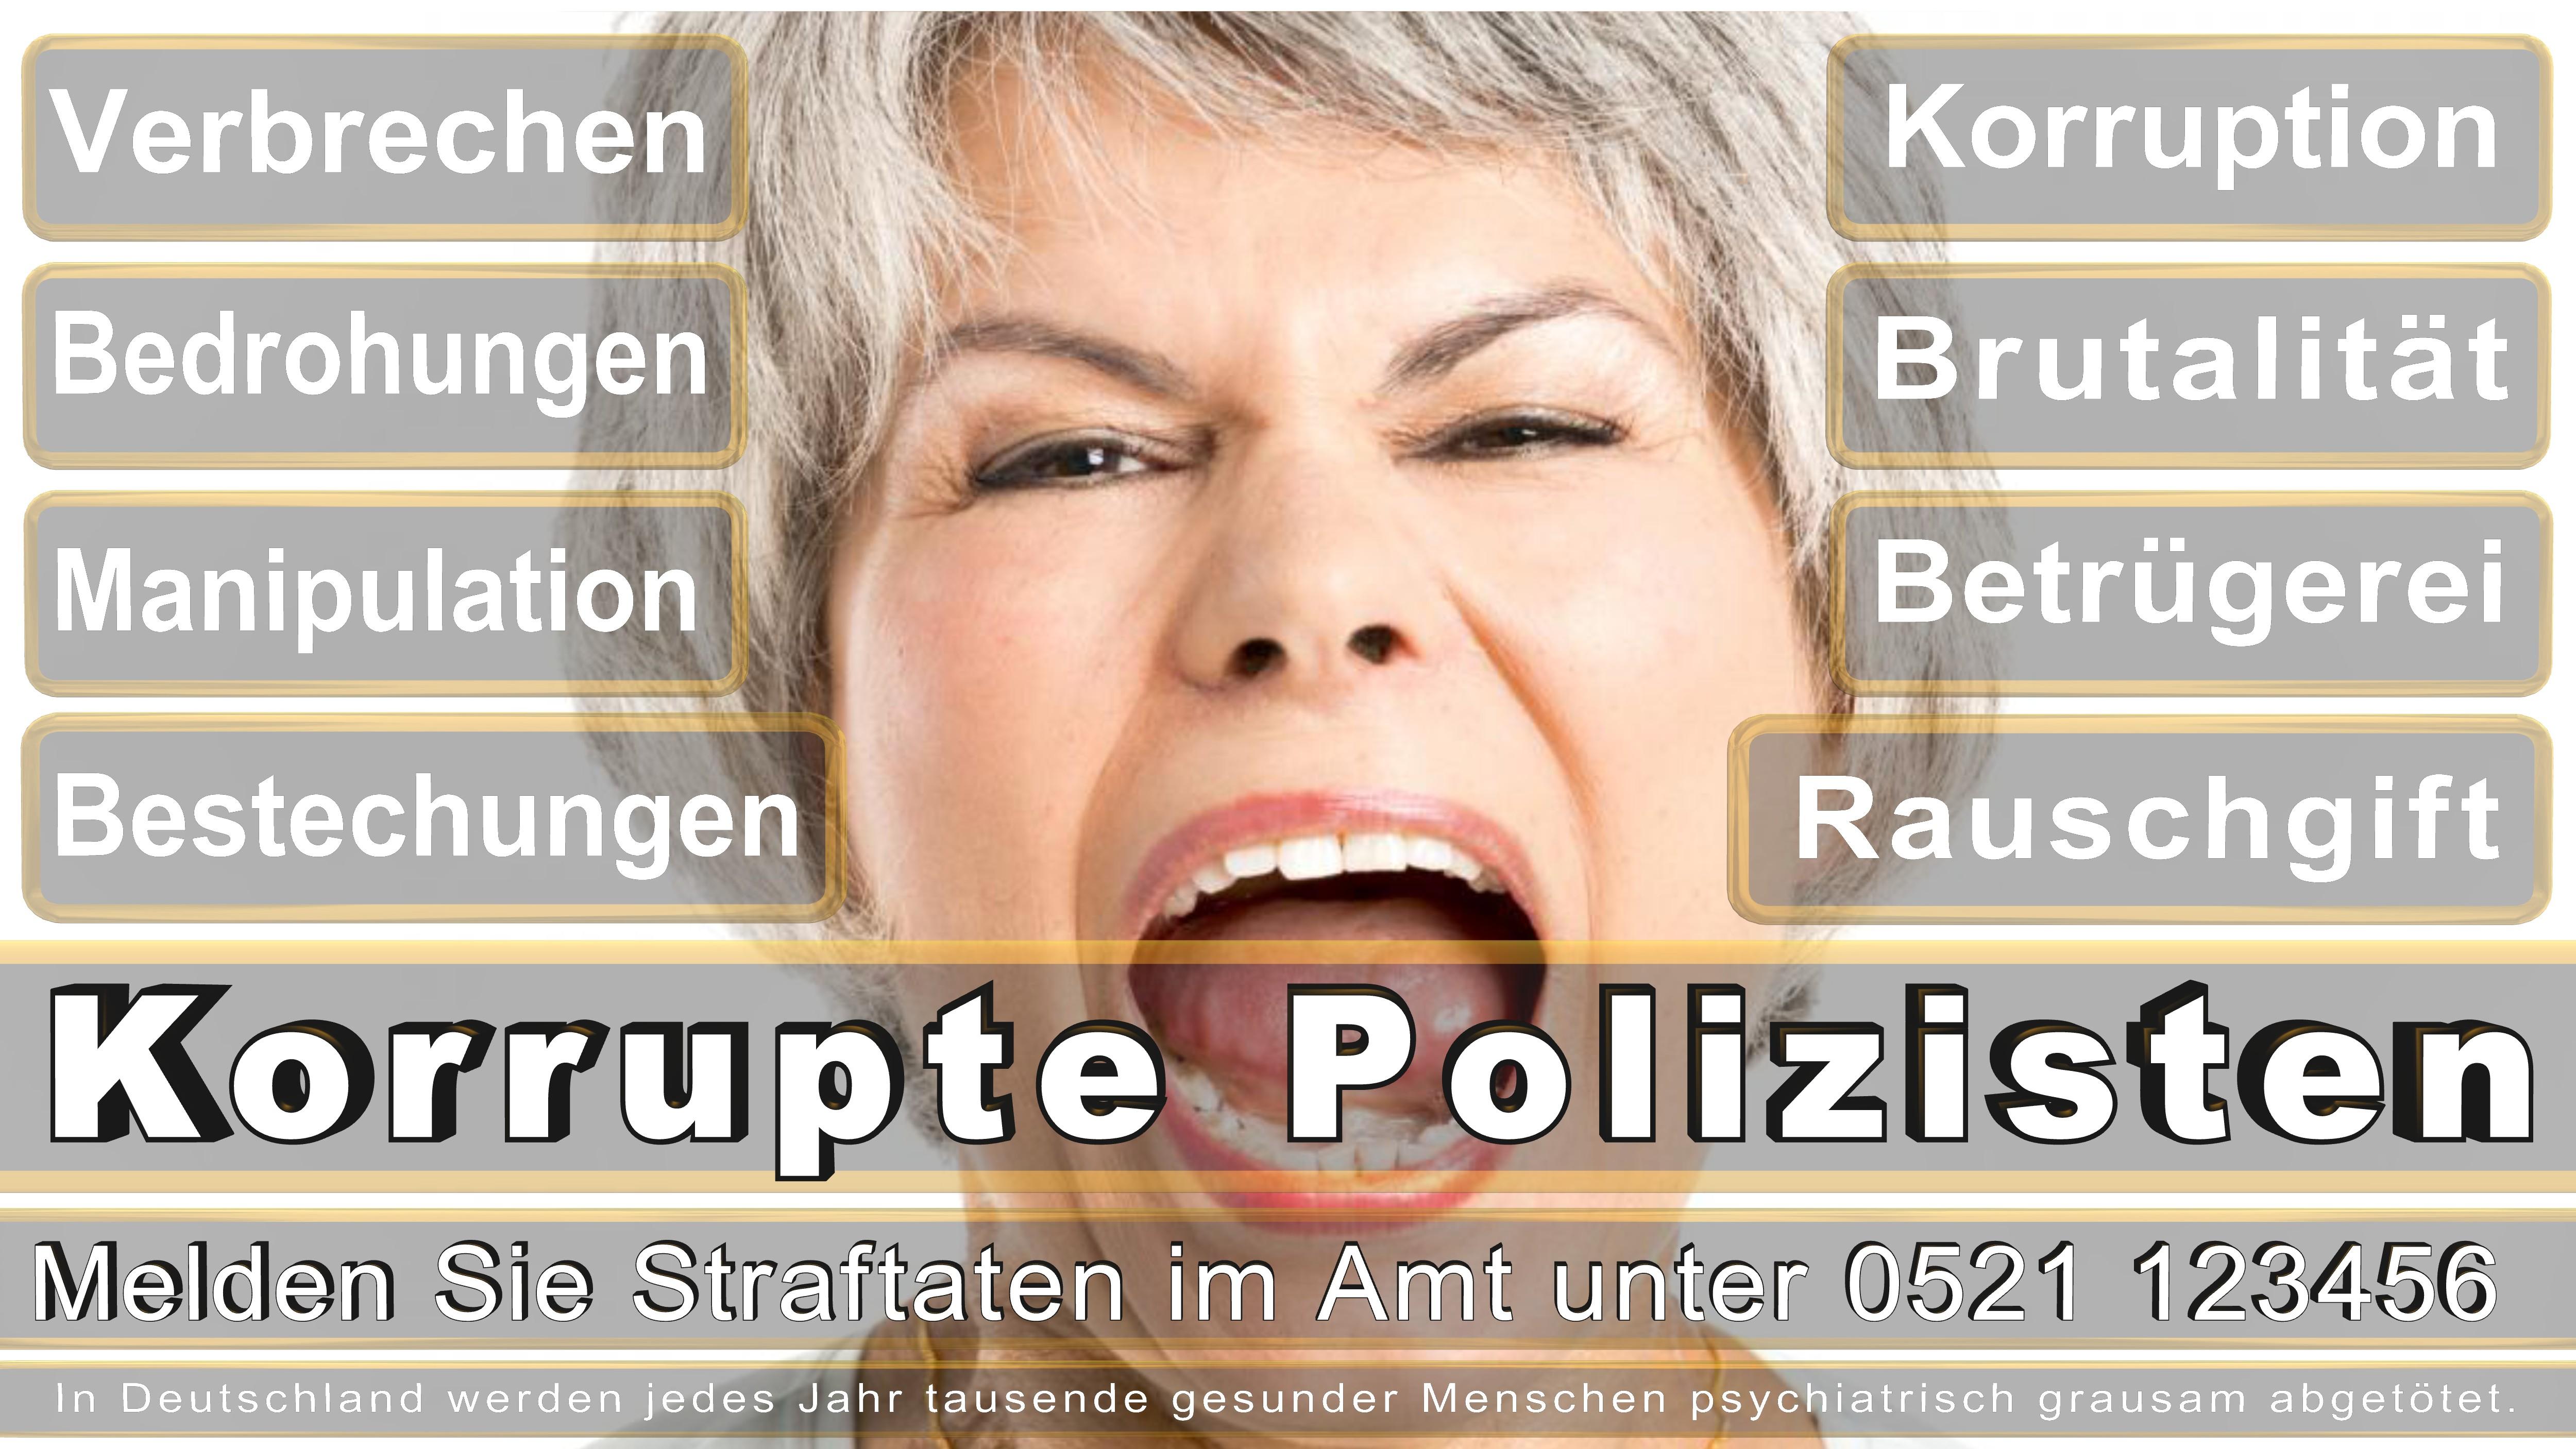 Polizei-Bielefeld-Polizei-Bielefeld-Polizei-Bielefeld (165)